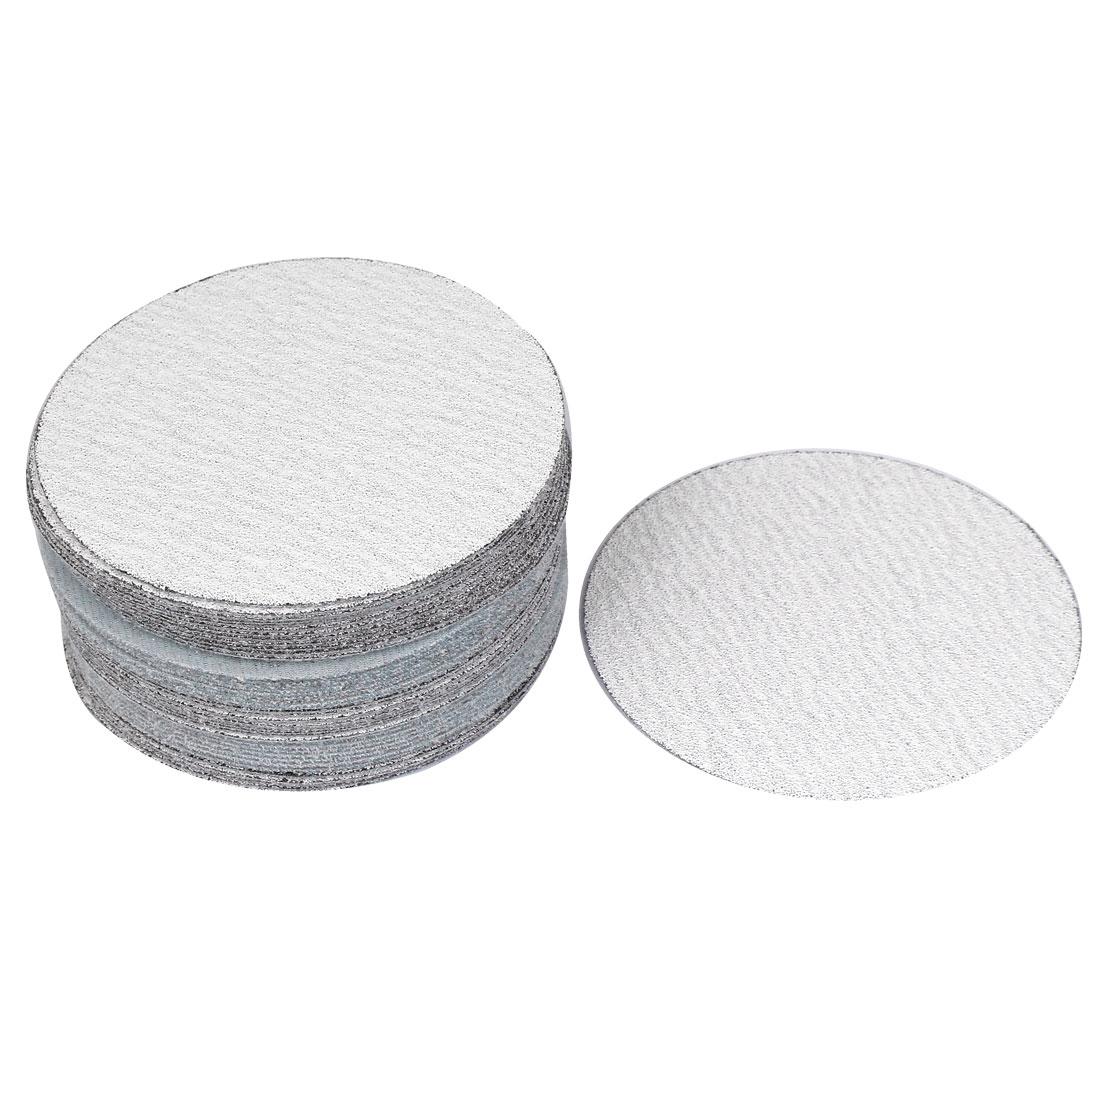 12.5cm Dia White Abrasives 80 Grit Round Hook and Loop Sanding Disc 50 Pcs